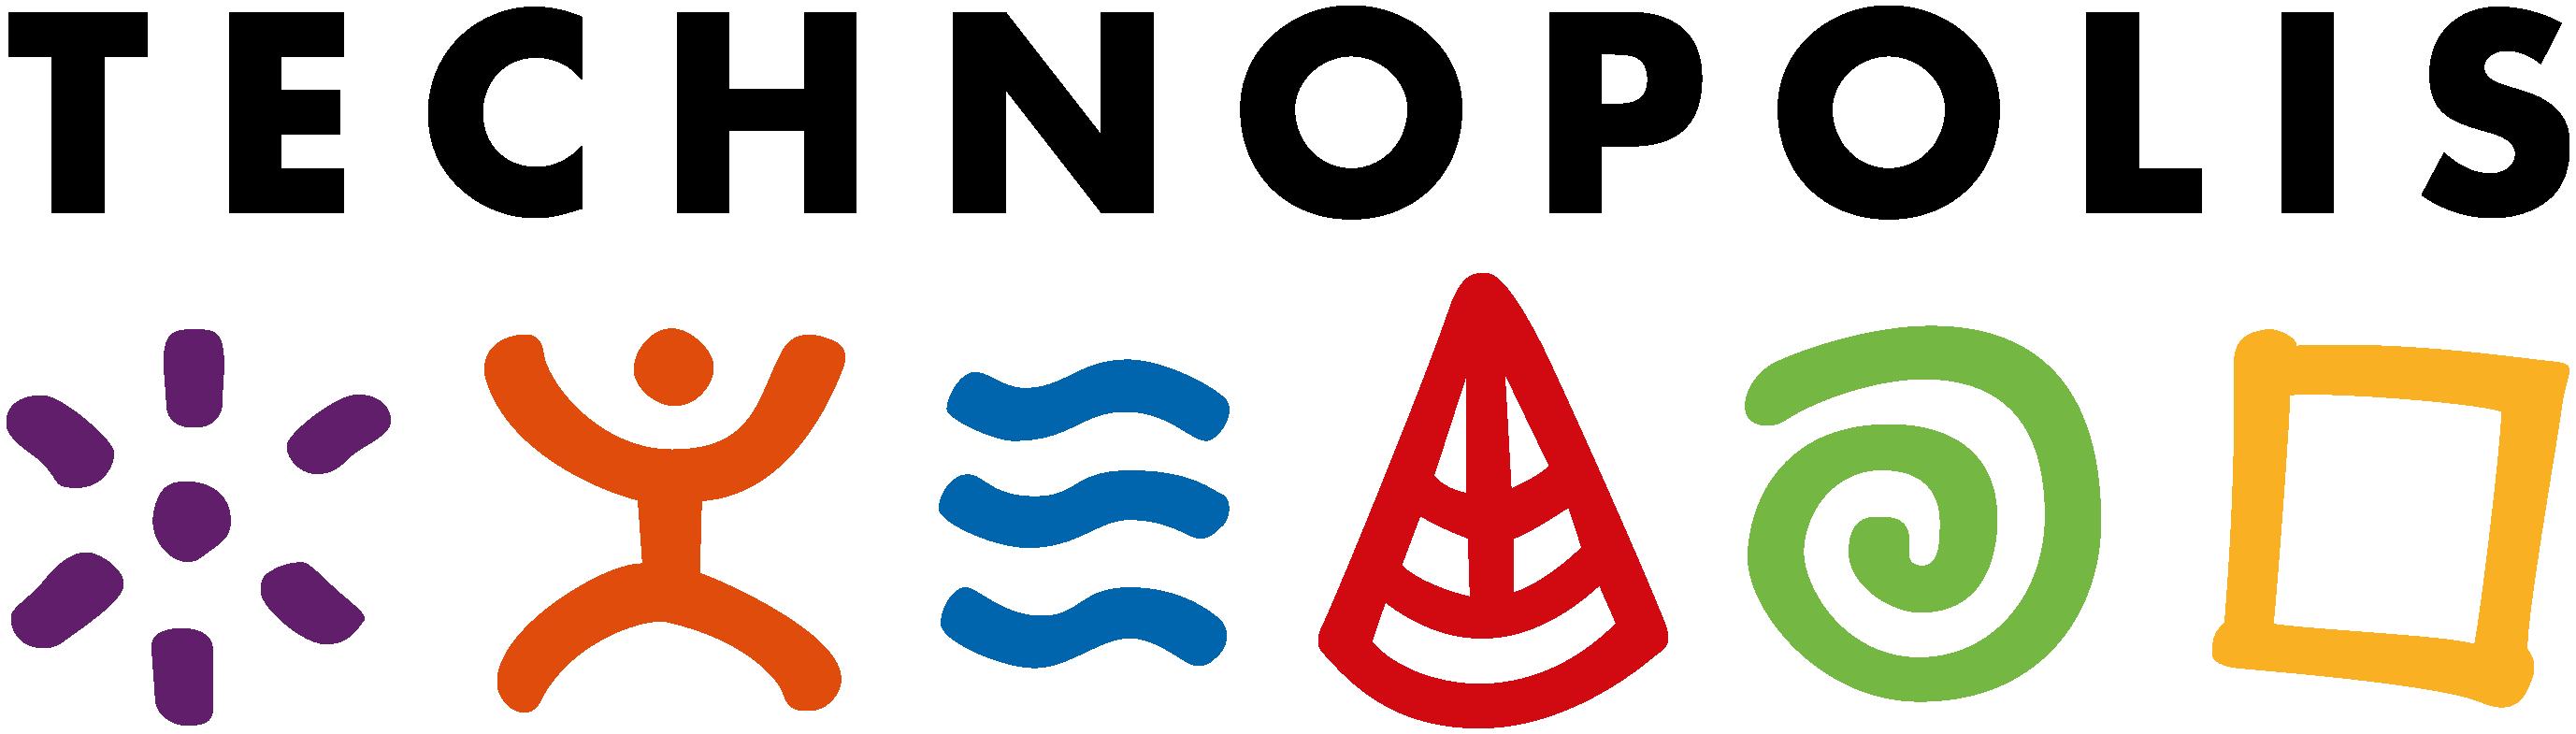 Technopolis logo quadri